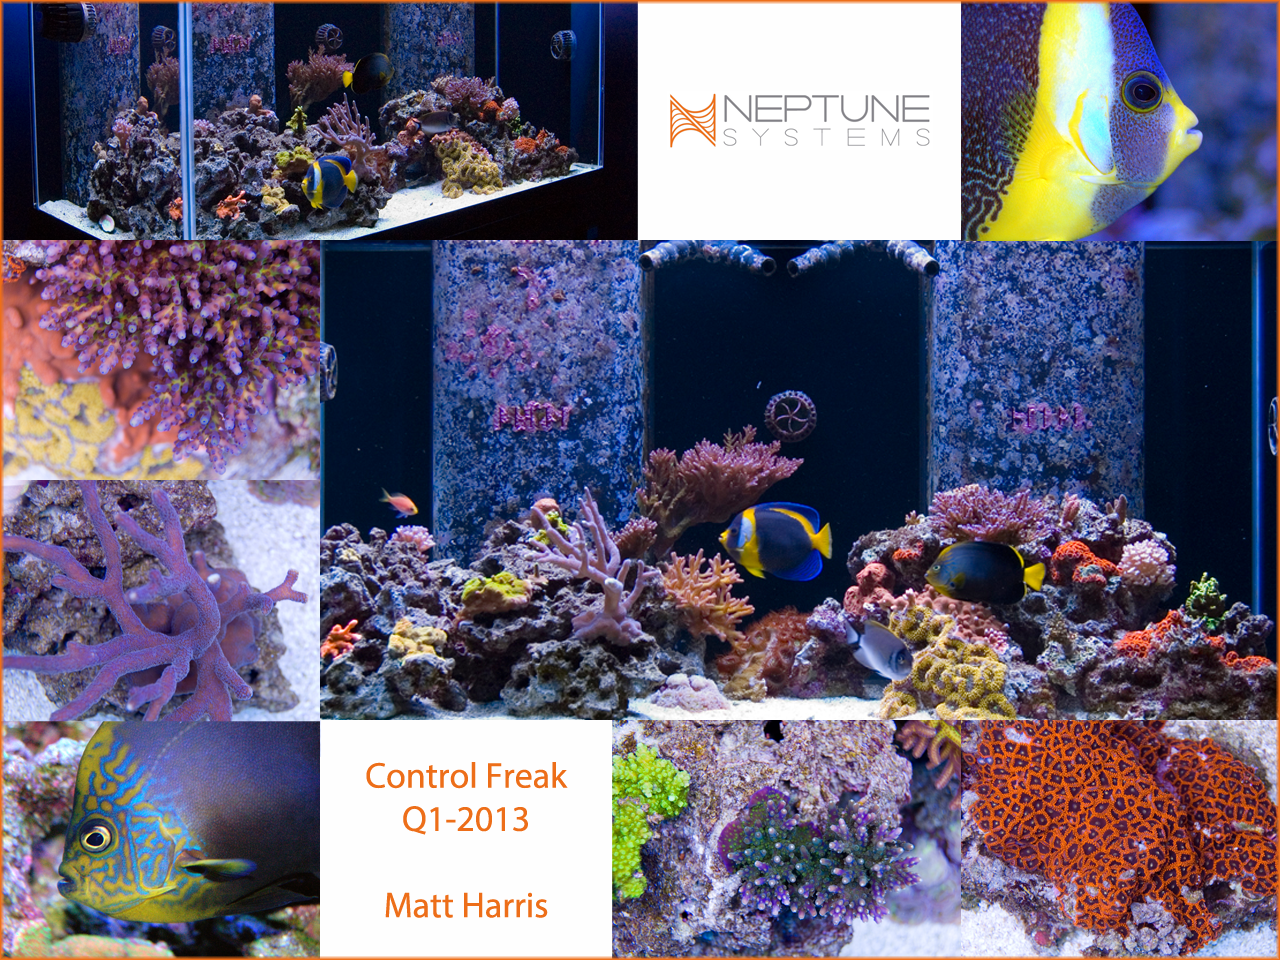 Control Freak Winner Q1 2013 Matt Harris Neptune Systems